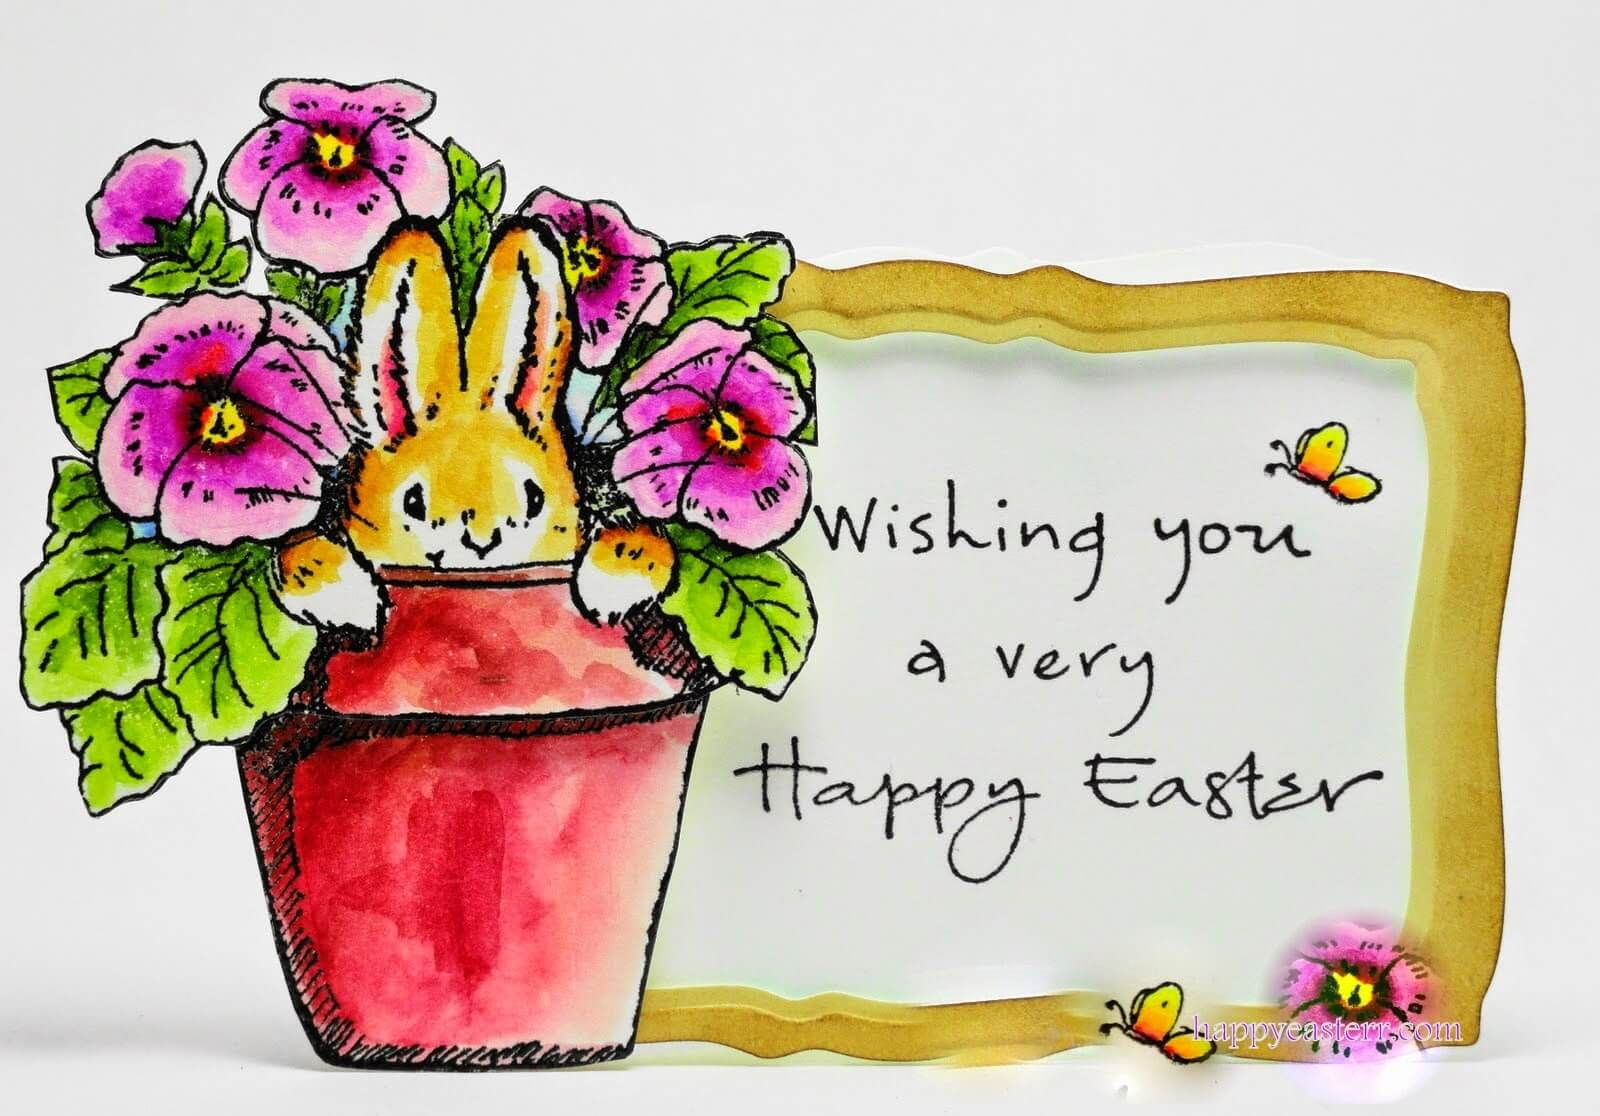 Happy Easter 2018 Ecards